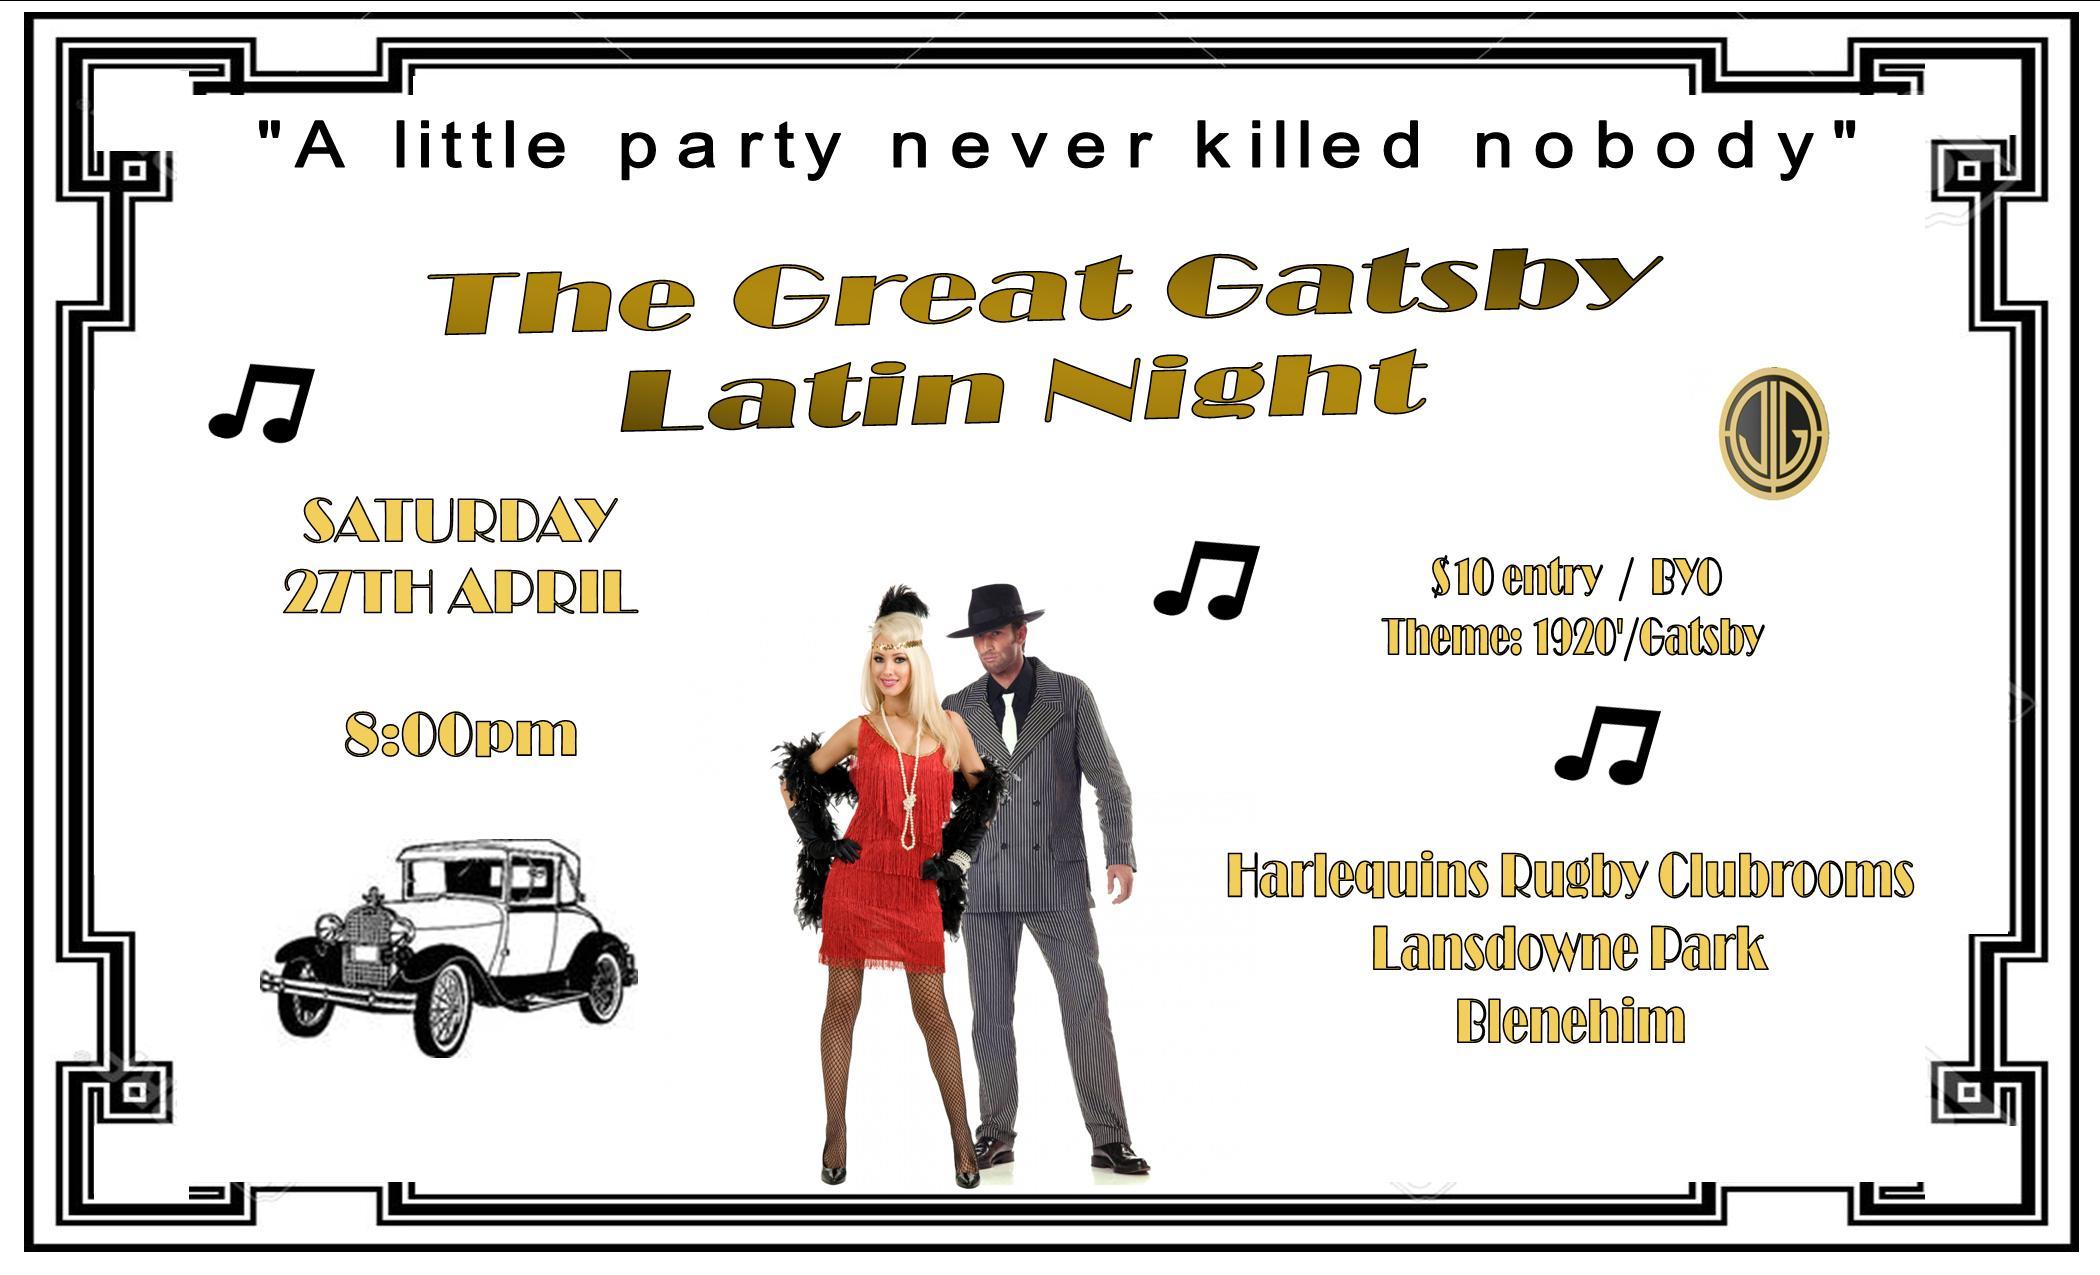 The Great Gatsby Latin Night - FB cover.jpg